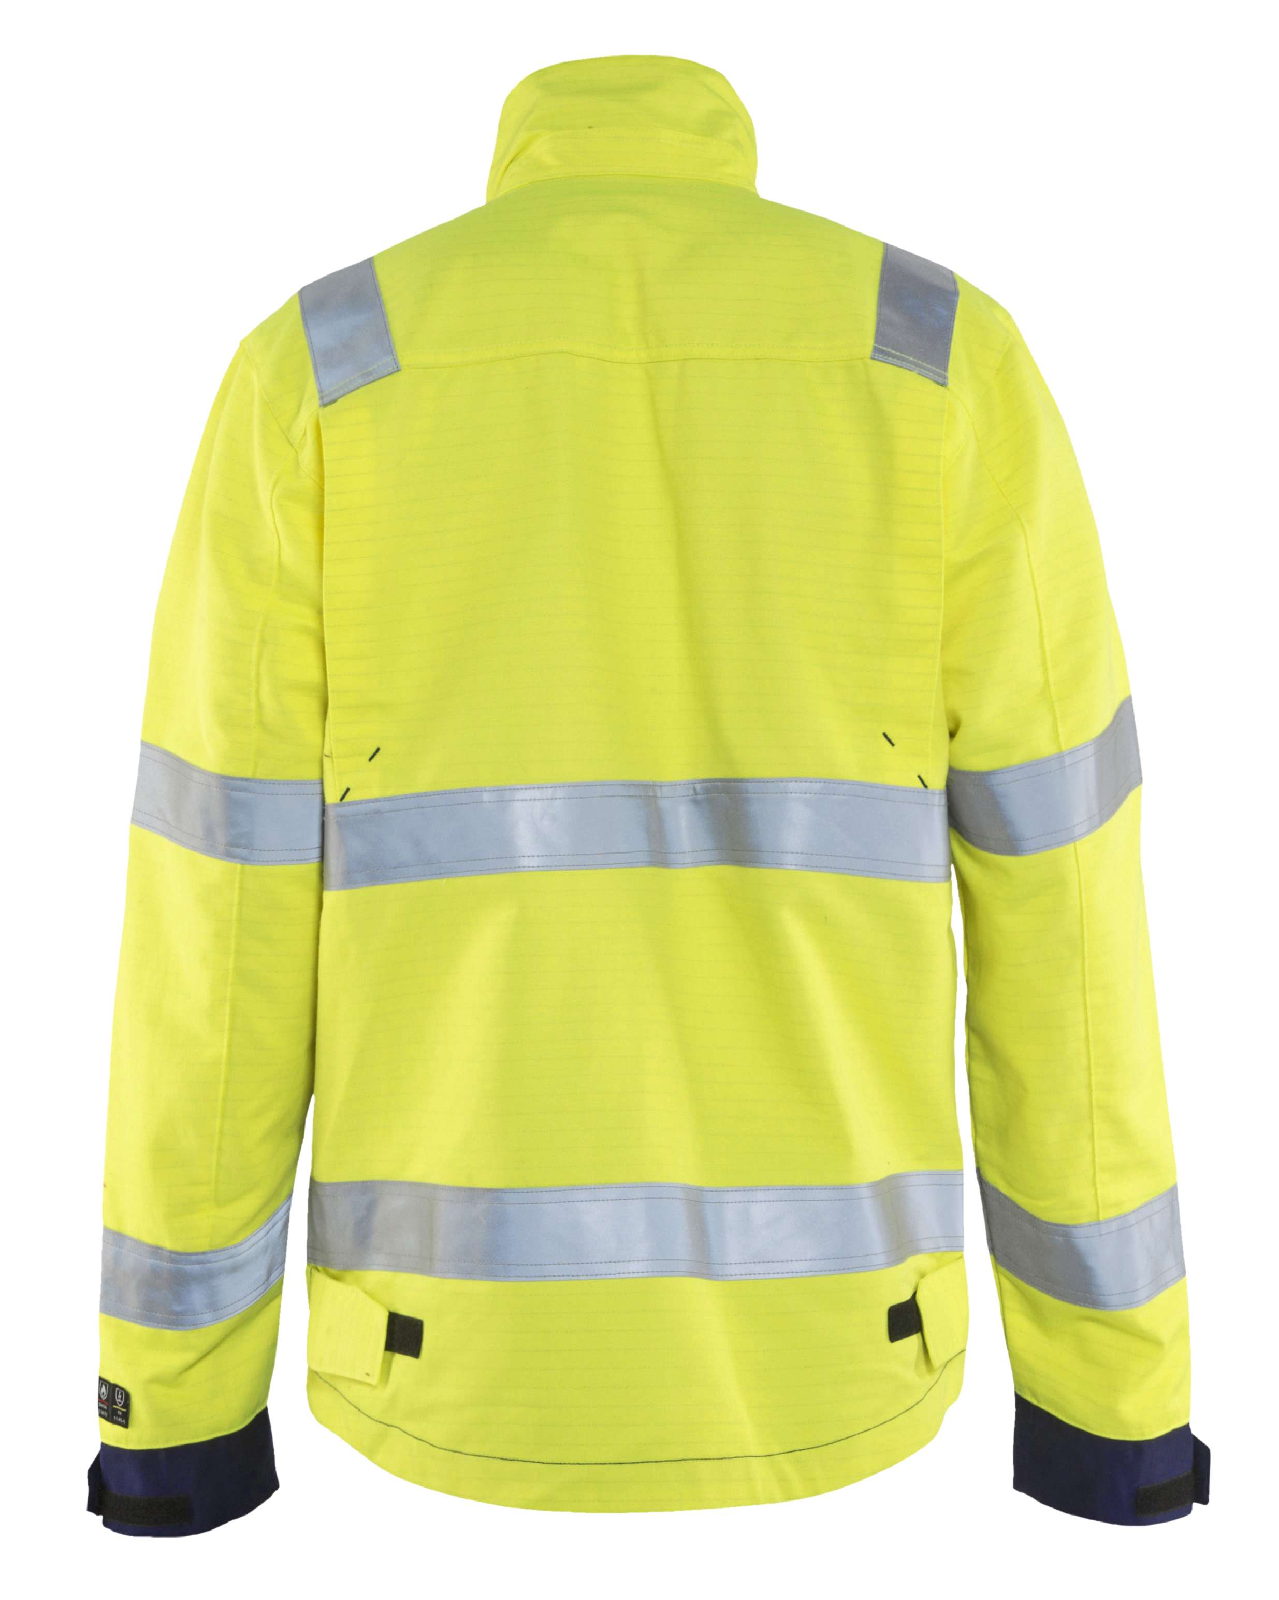 Blaklader Combi-jacks 40871514 Multinorm geel-marineblauw(3389)